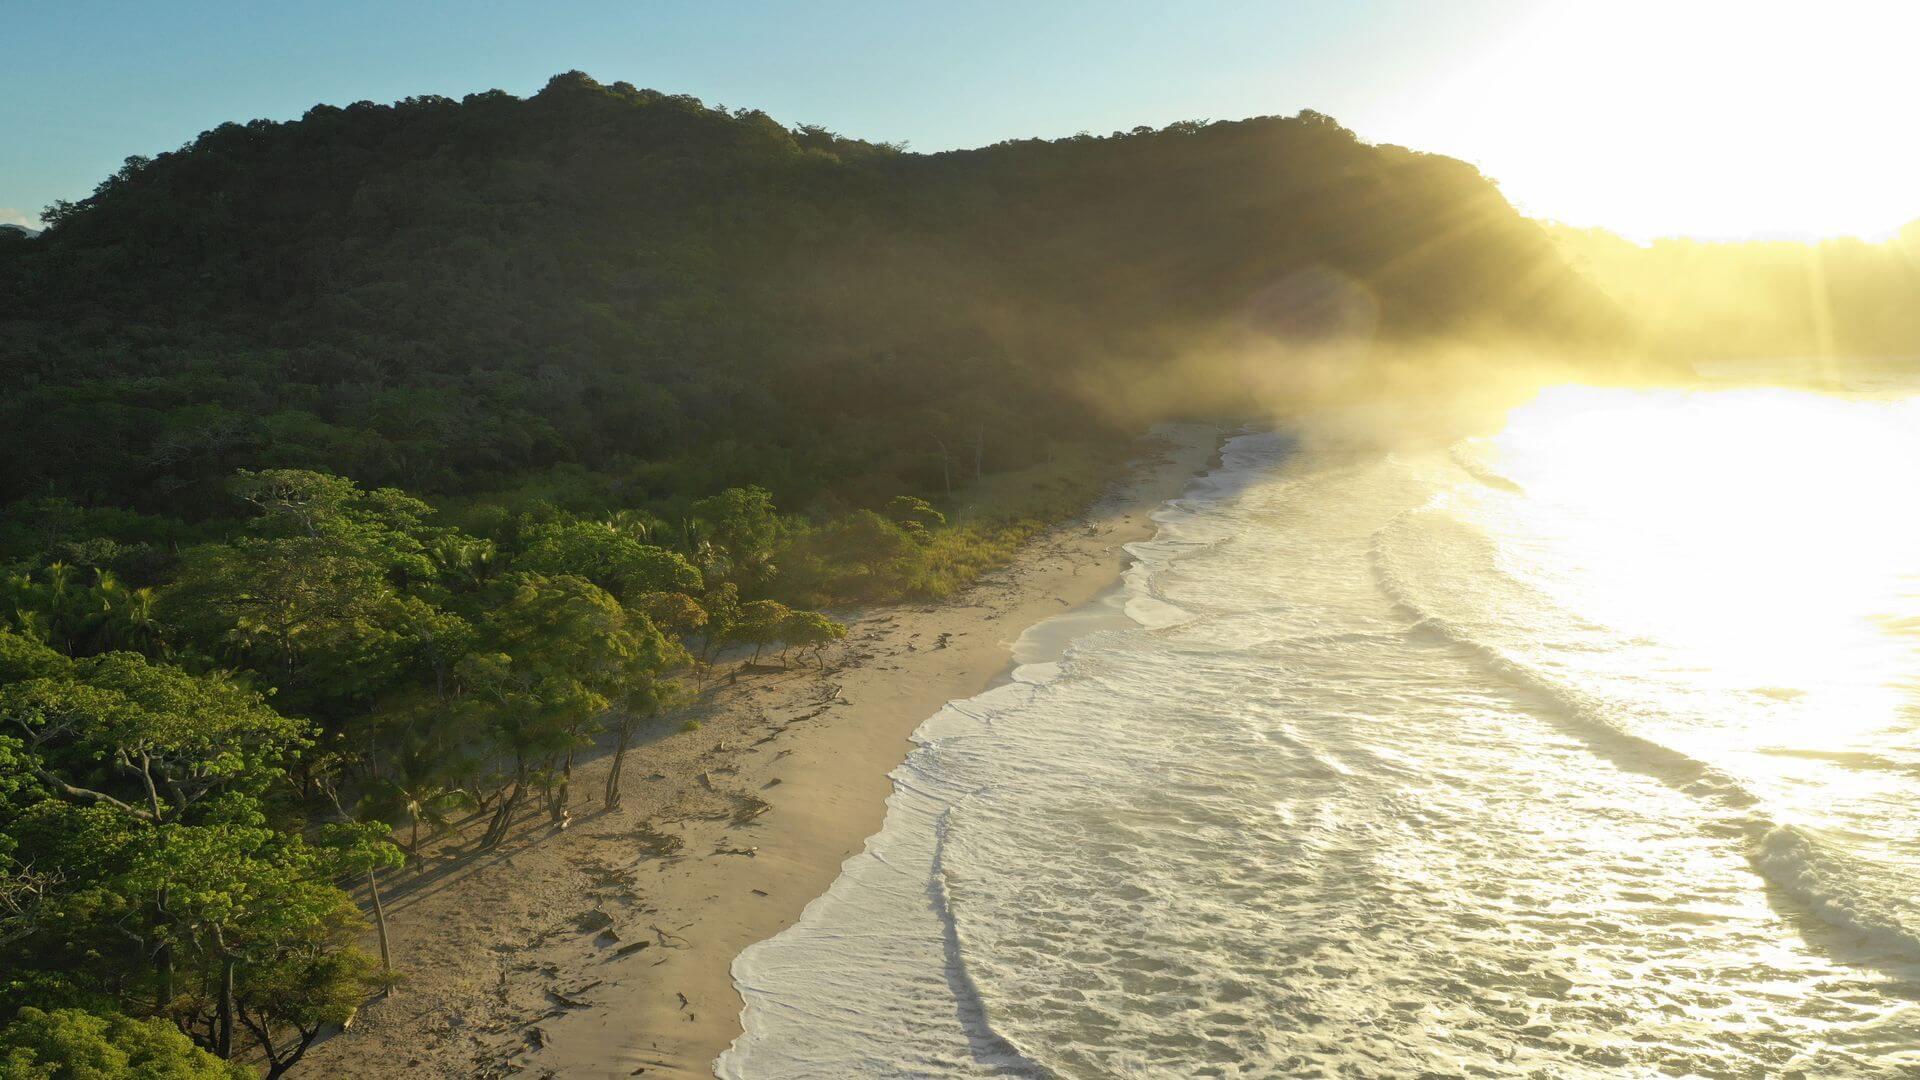 Barrigona Beach White Sand And Waves